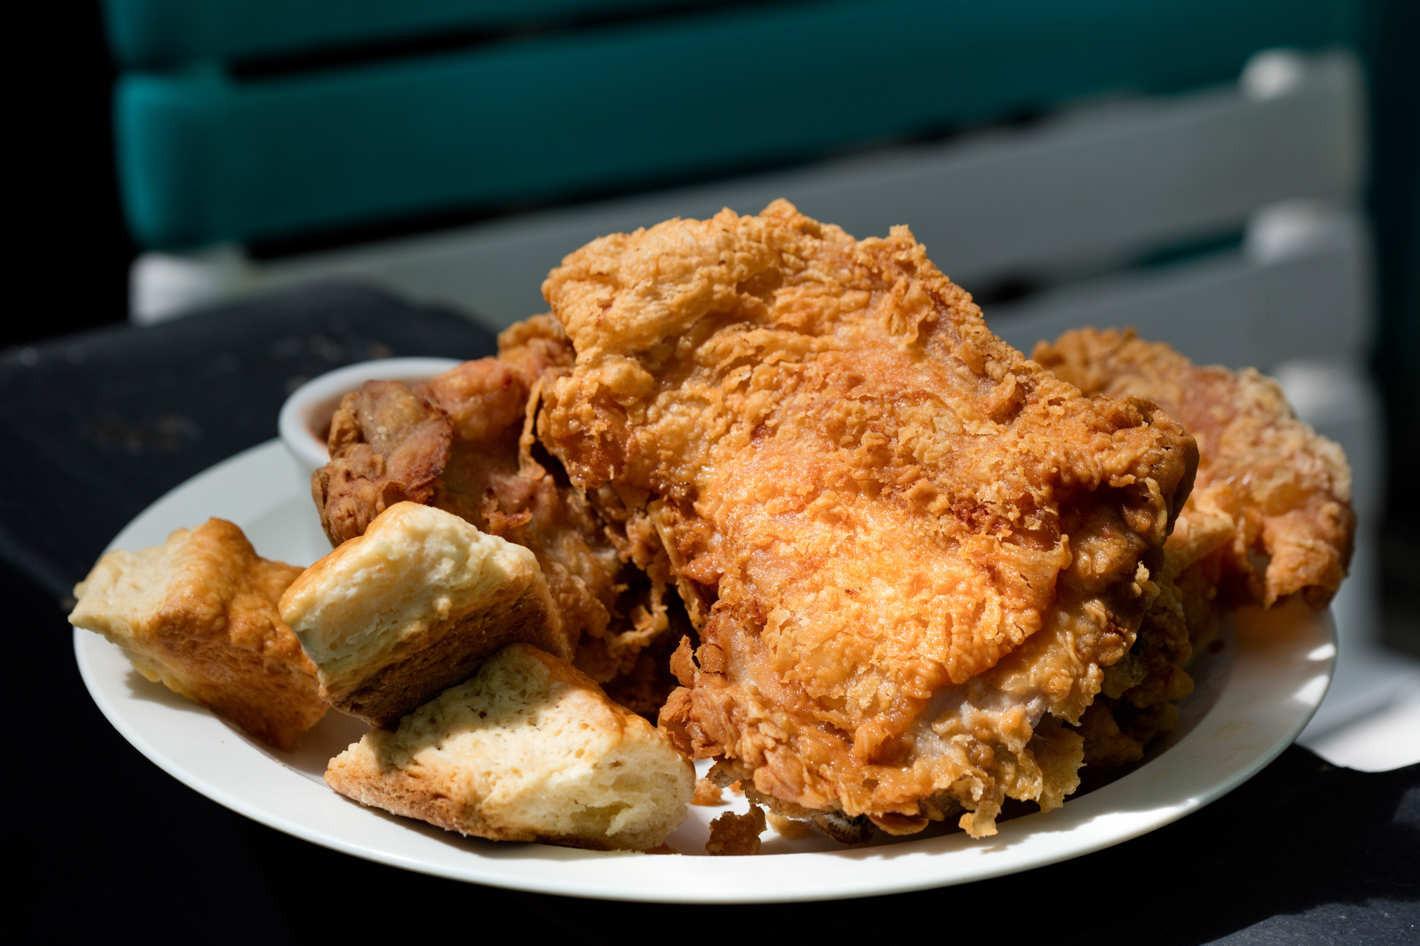 Best Fried Chicken  The Absolute Best Fried Chicken in NYC